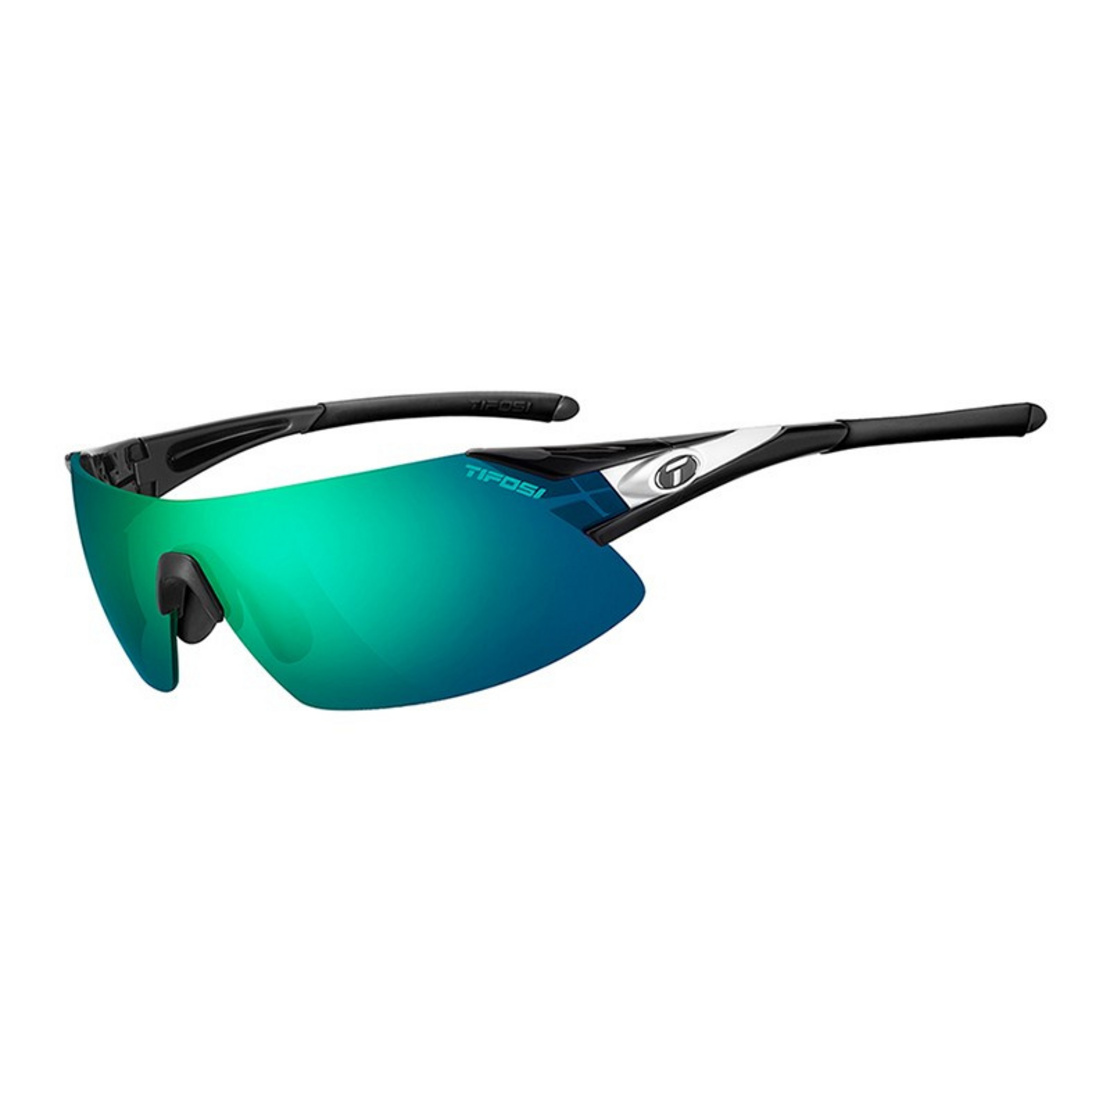 Tifosi แว่นกันแดด รุ่น PODIUM XC Black/White (Clarion Green/AC Red/Clear)